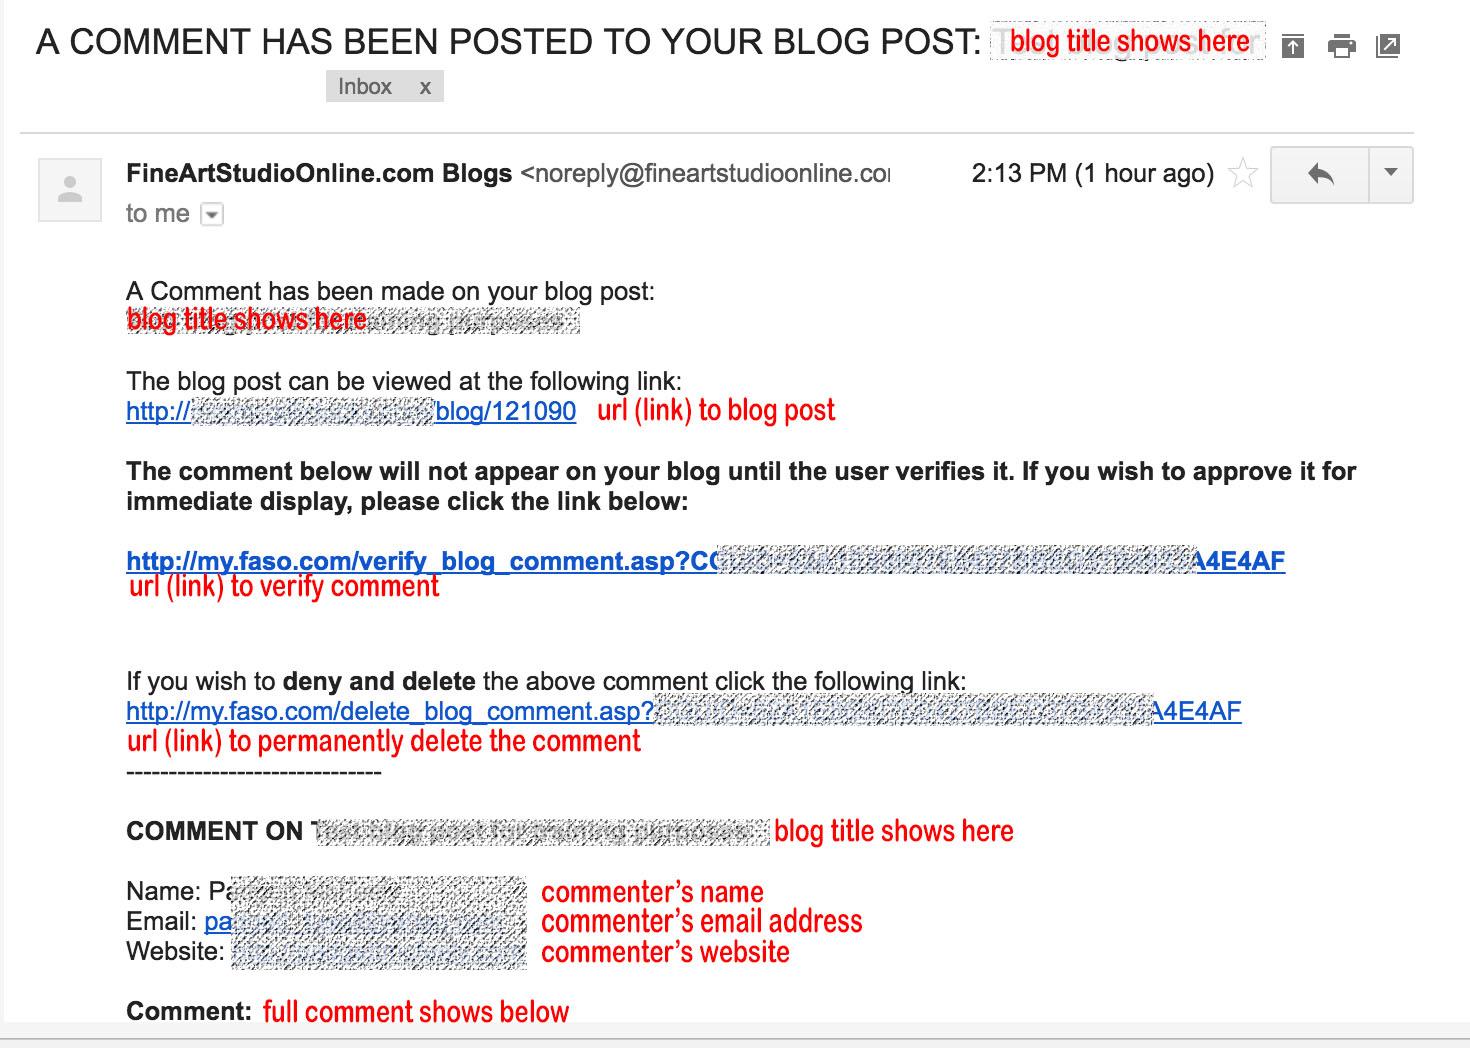 BoldBrush — Email Verification Process for Blog Comments Explained